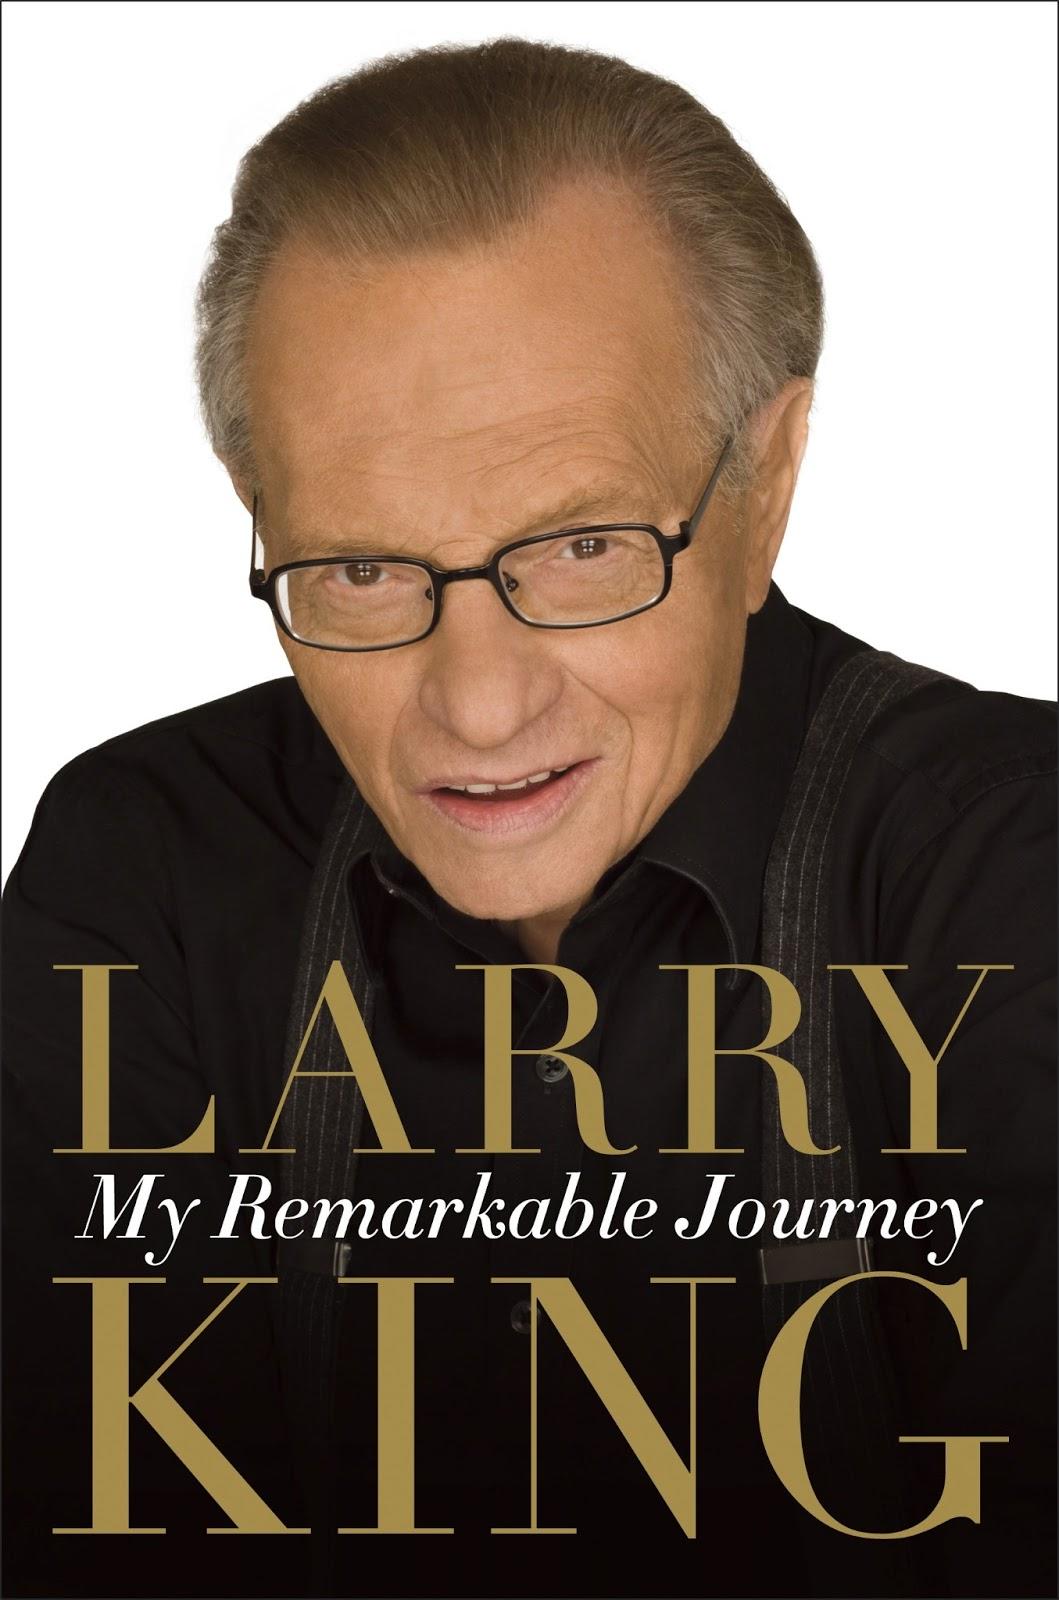 Larry King Hairstyle Men Hairstyles Men Hair Styles